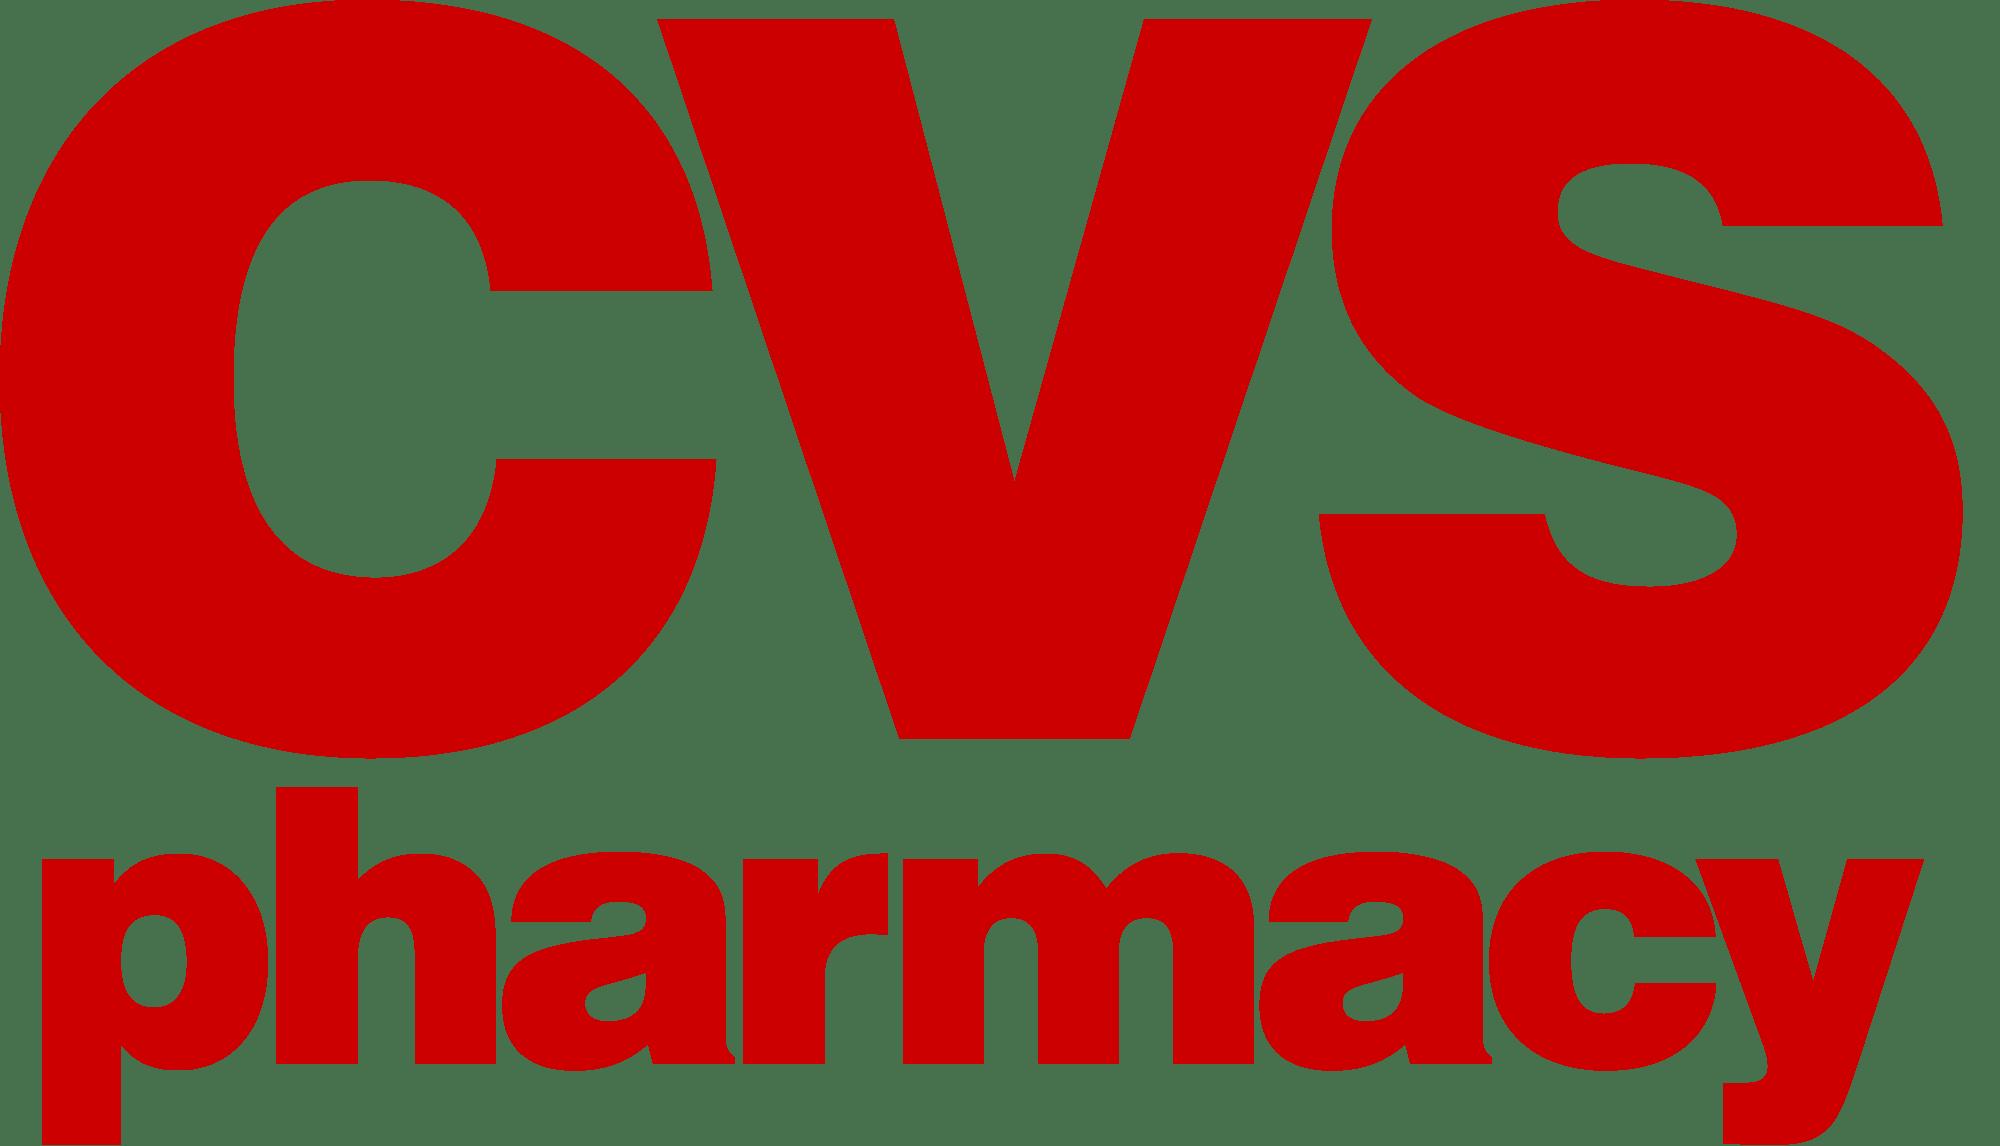 CVS Deal汇总 (01/01/17-01/07/17)